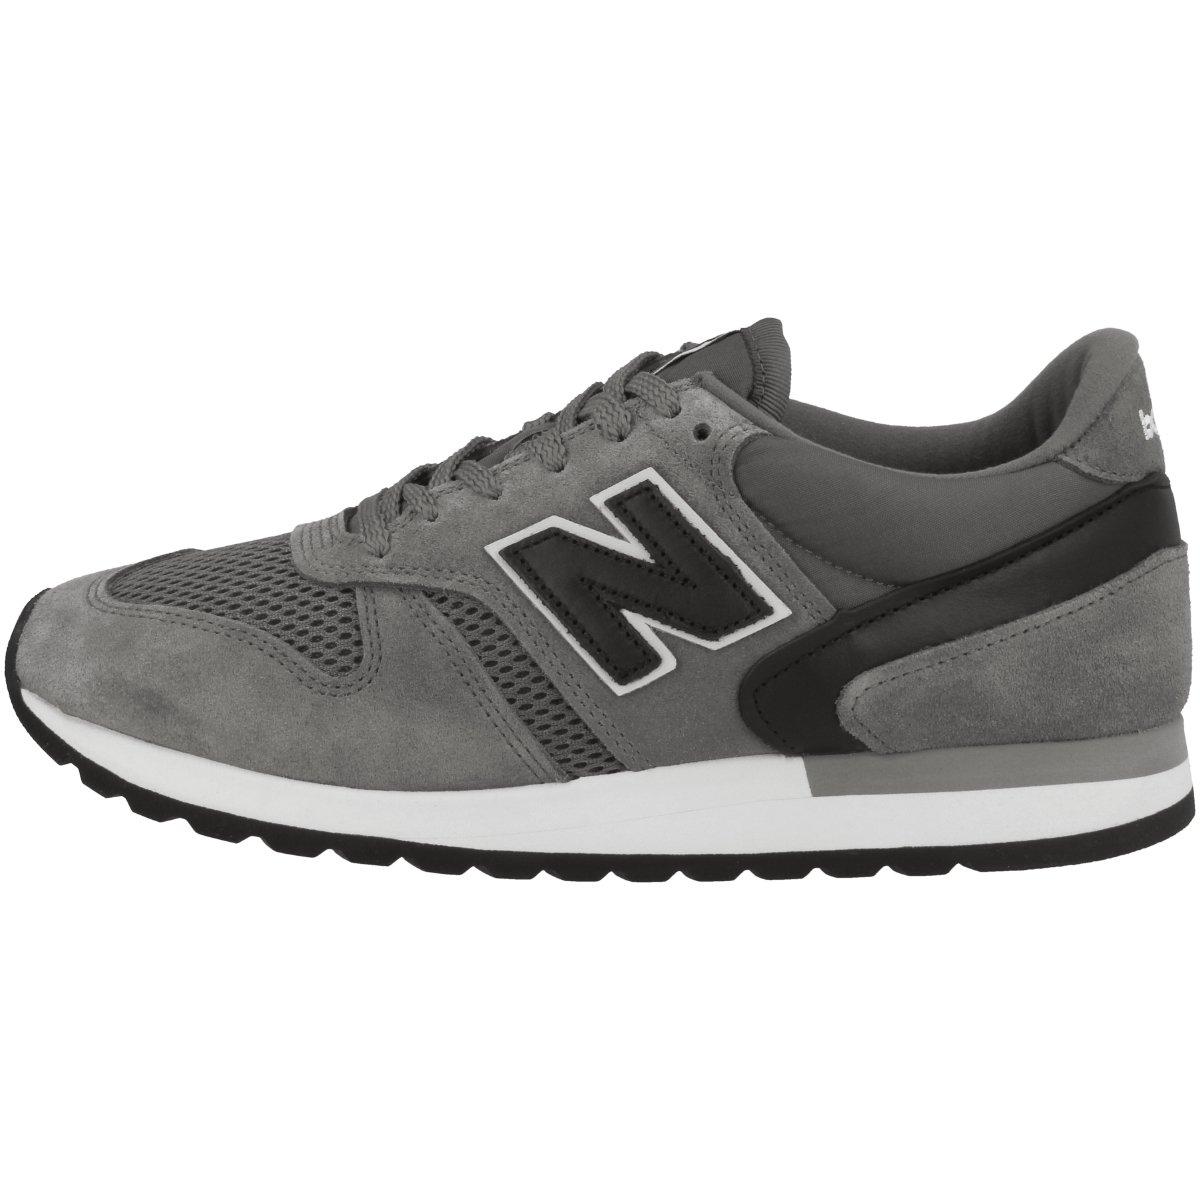 New Balance M770, GN Grey 42,5 (UK 8,5|GN grey